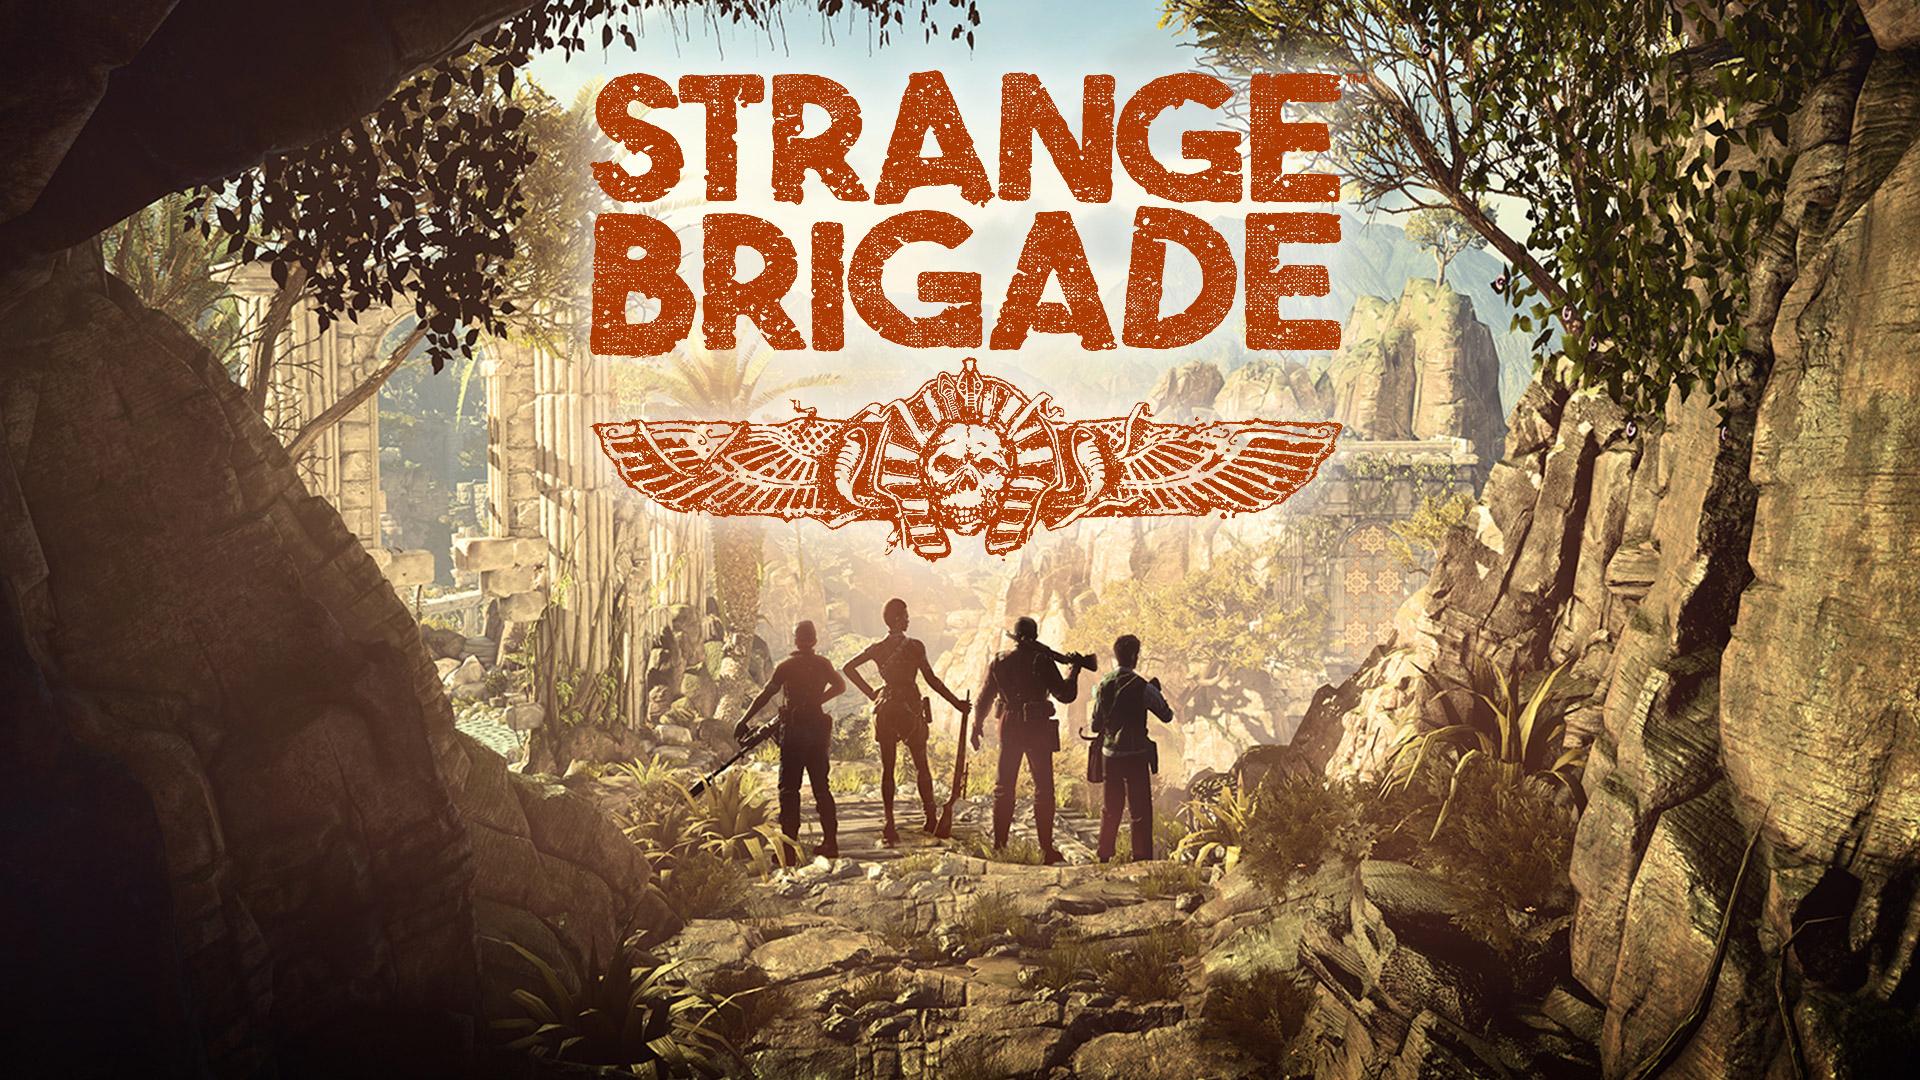 Free Strange Brigade Wallpaper in 1920x1080